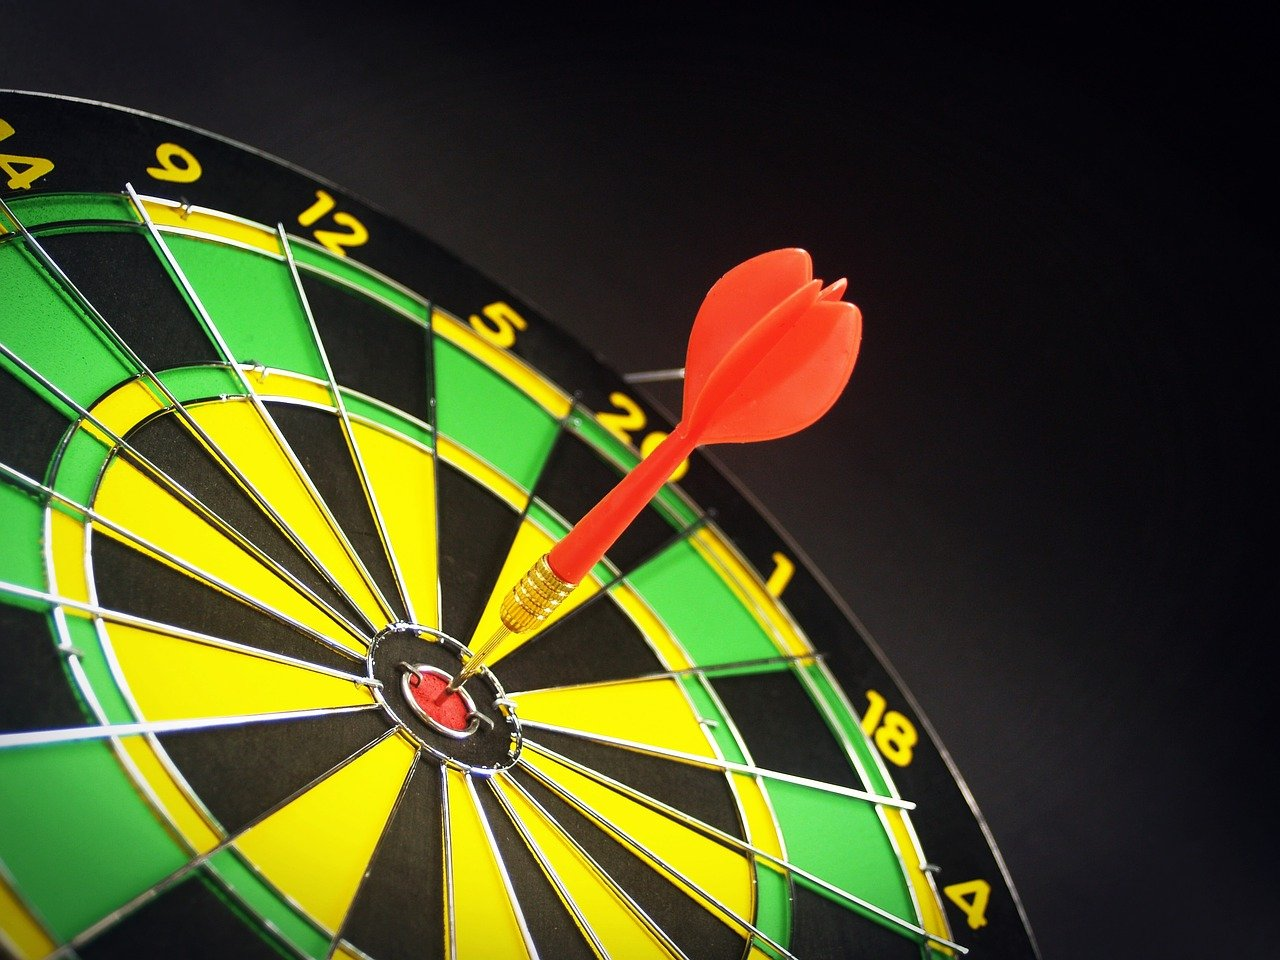 Target Goal Aiming Dartboard Aim Focus Arrow S